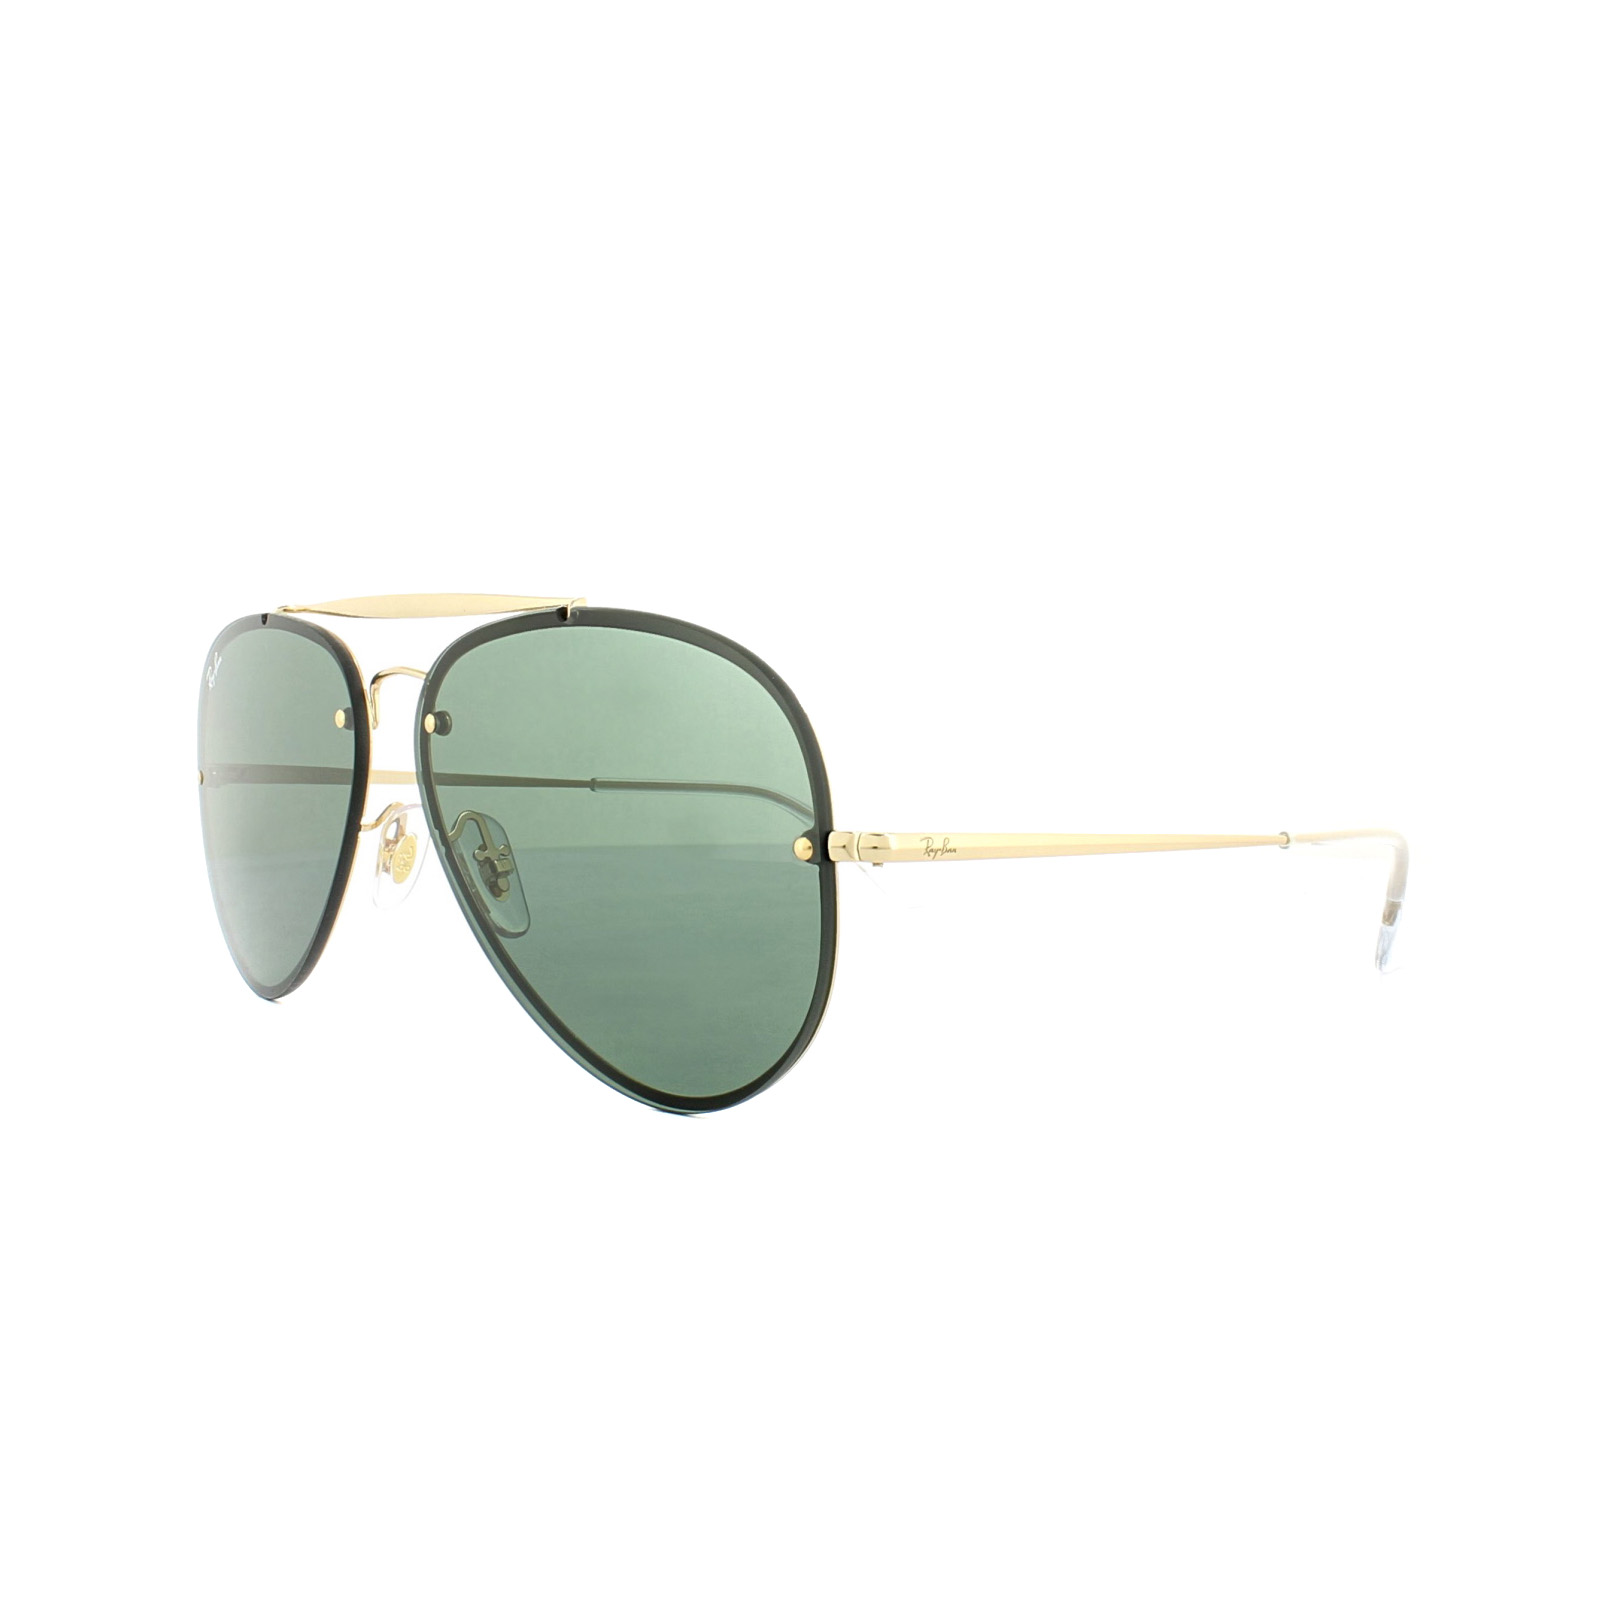 380c7c07402 Sentinel Ray-Ban Sunglasses Blaze Aviator 3584N 905071 Gold Green G-15